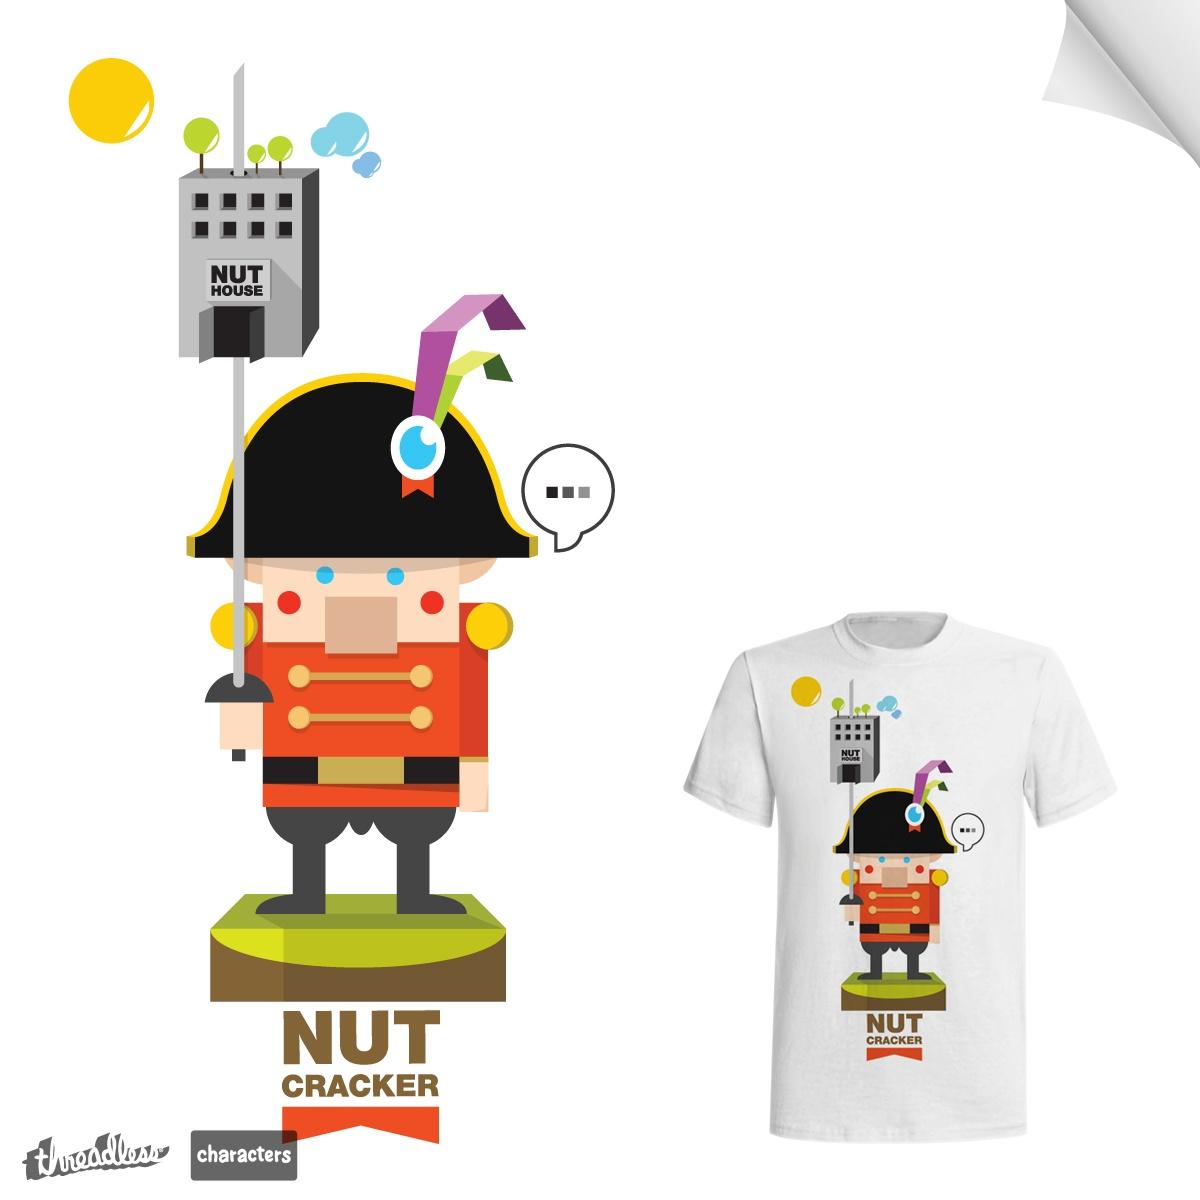 Nut Cracker by MarsBlackbird on Threadless